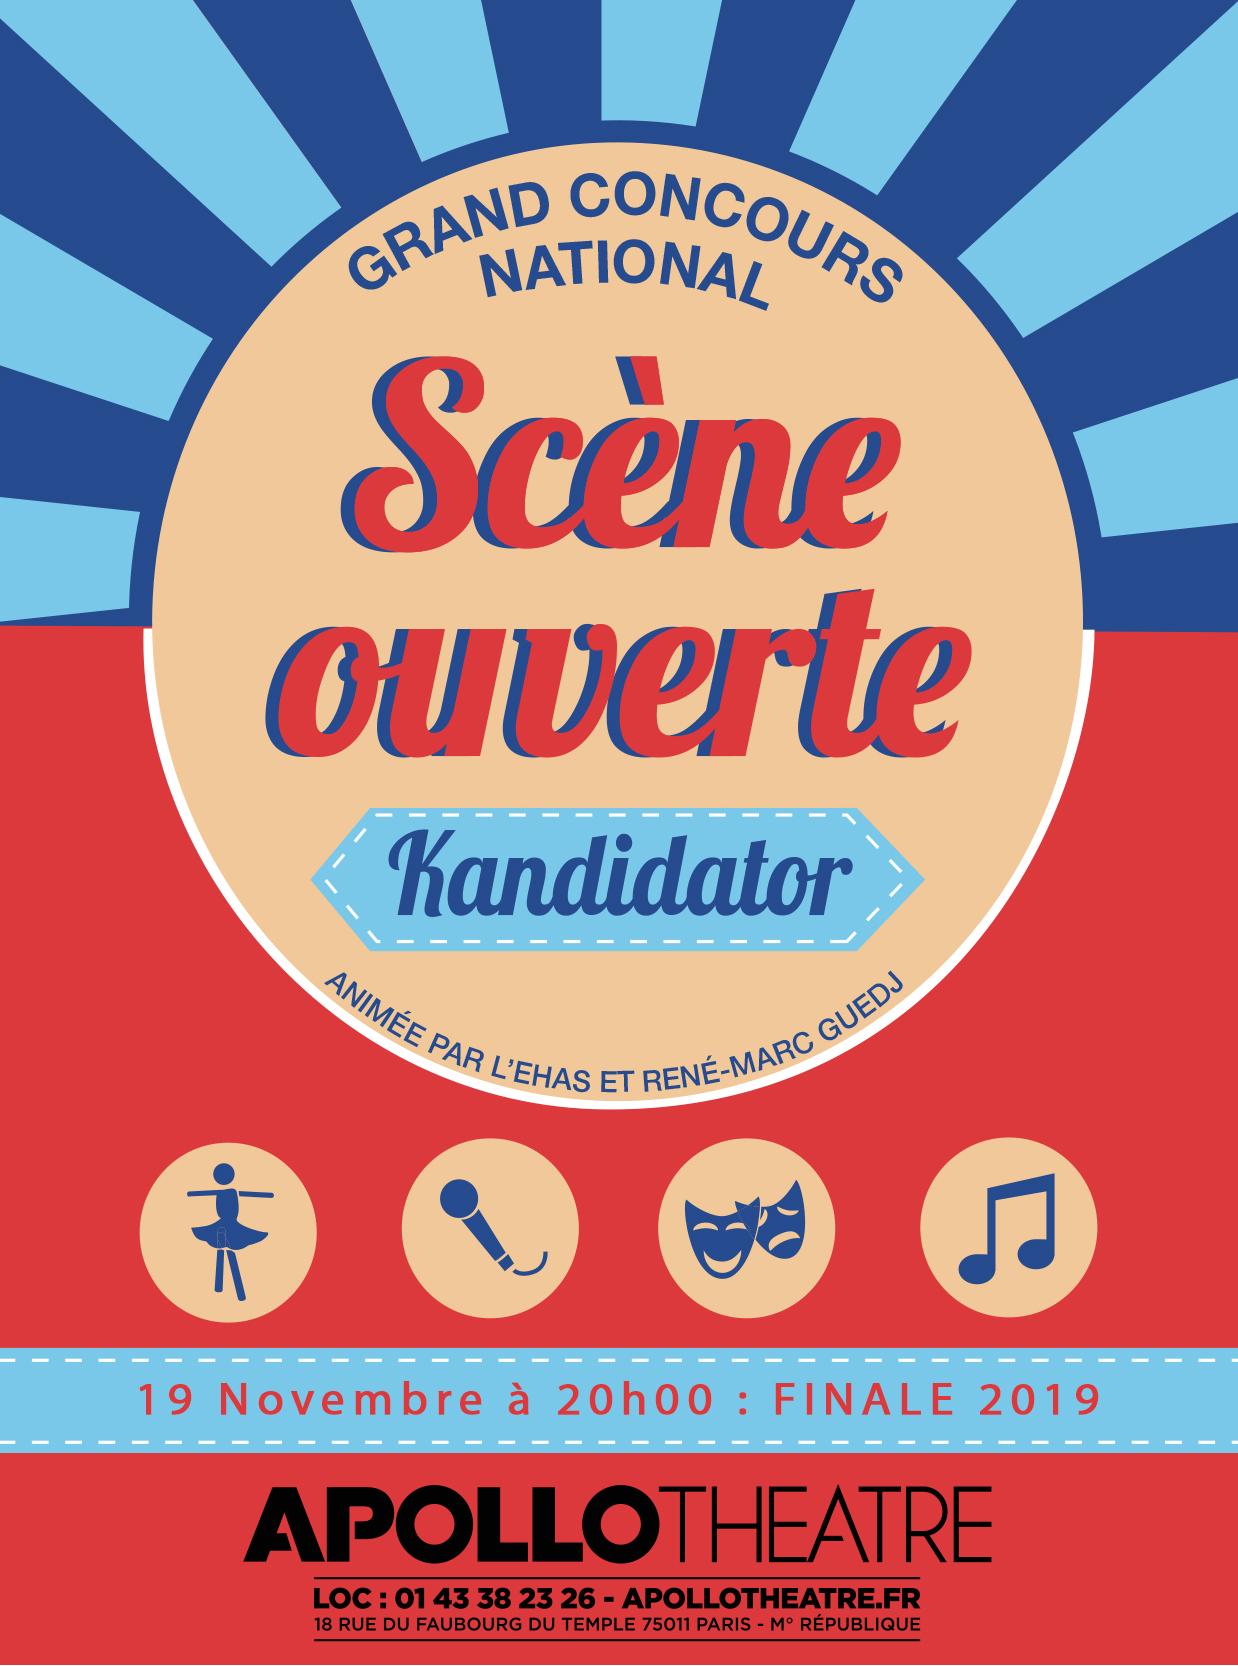 Finale Kandidator 2019, le 19 Novembre - Apollo Théâtre